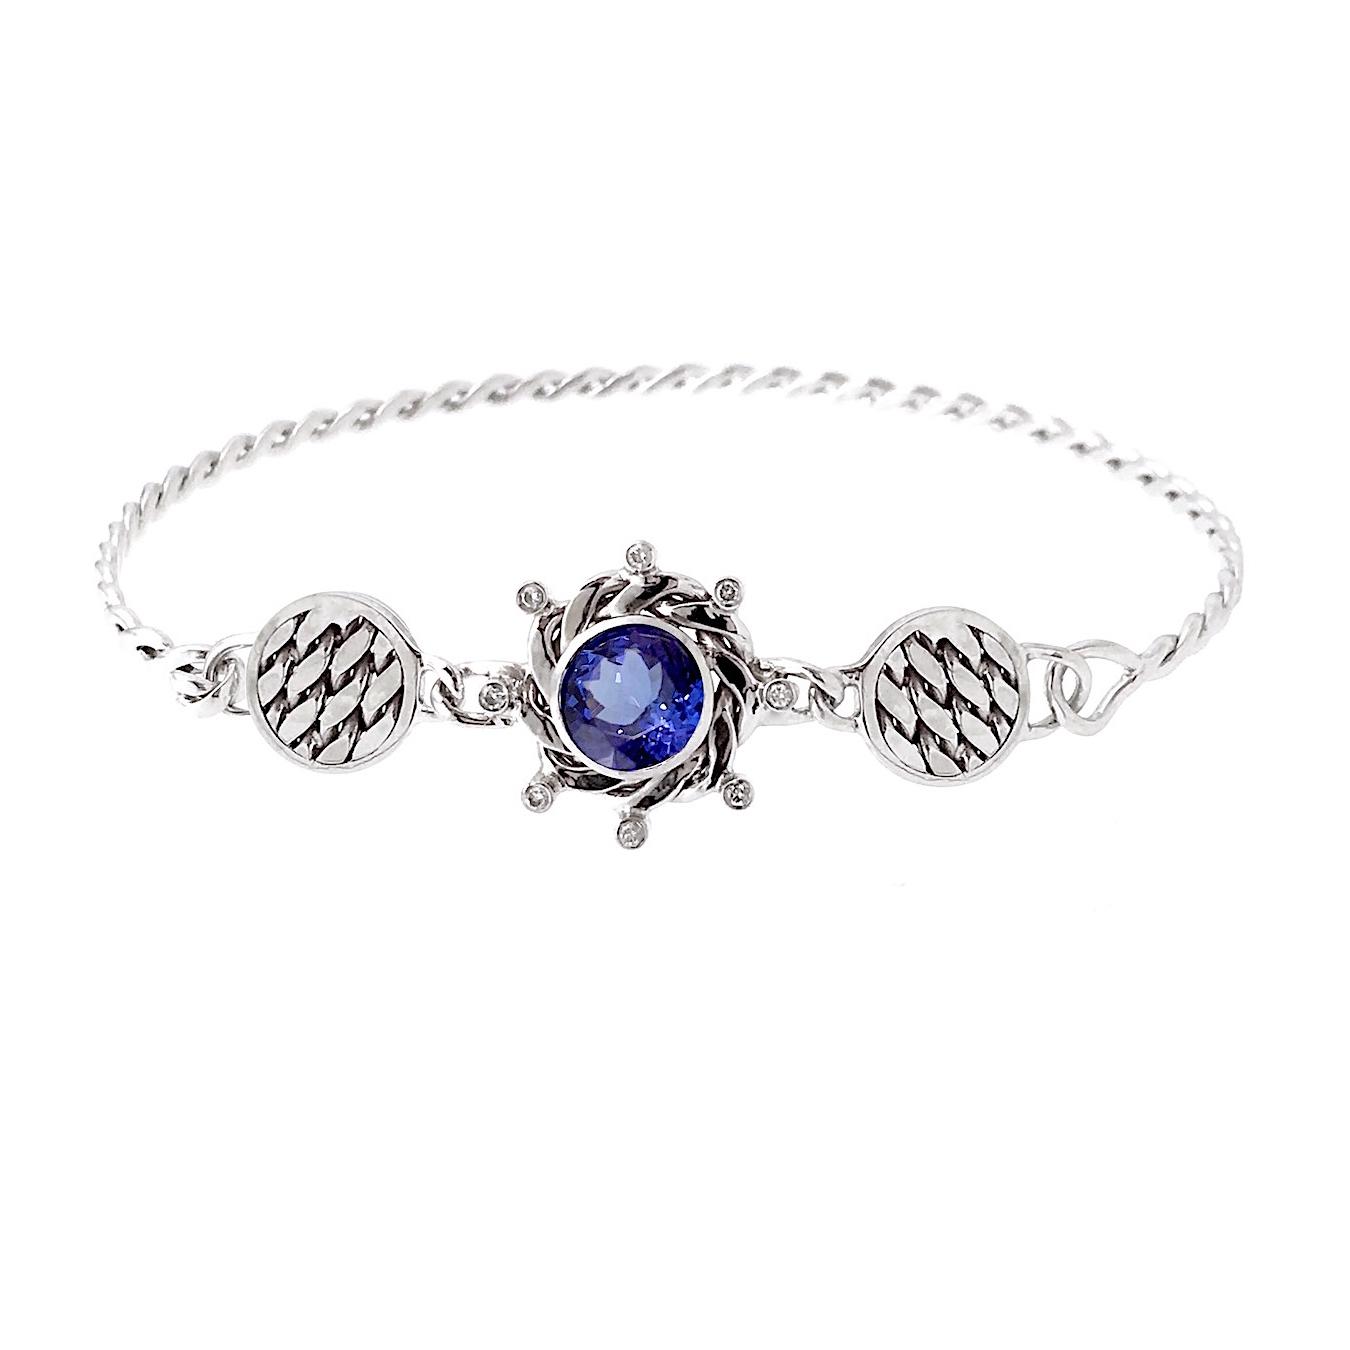 18k-White-Gold-Infinity-Twist-Diamond-Tanzanite-Double-Textured-Disc-Bangle-bracelet-Jewelyrie-Eclipse